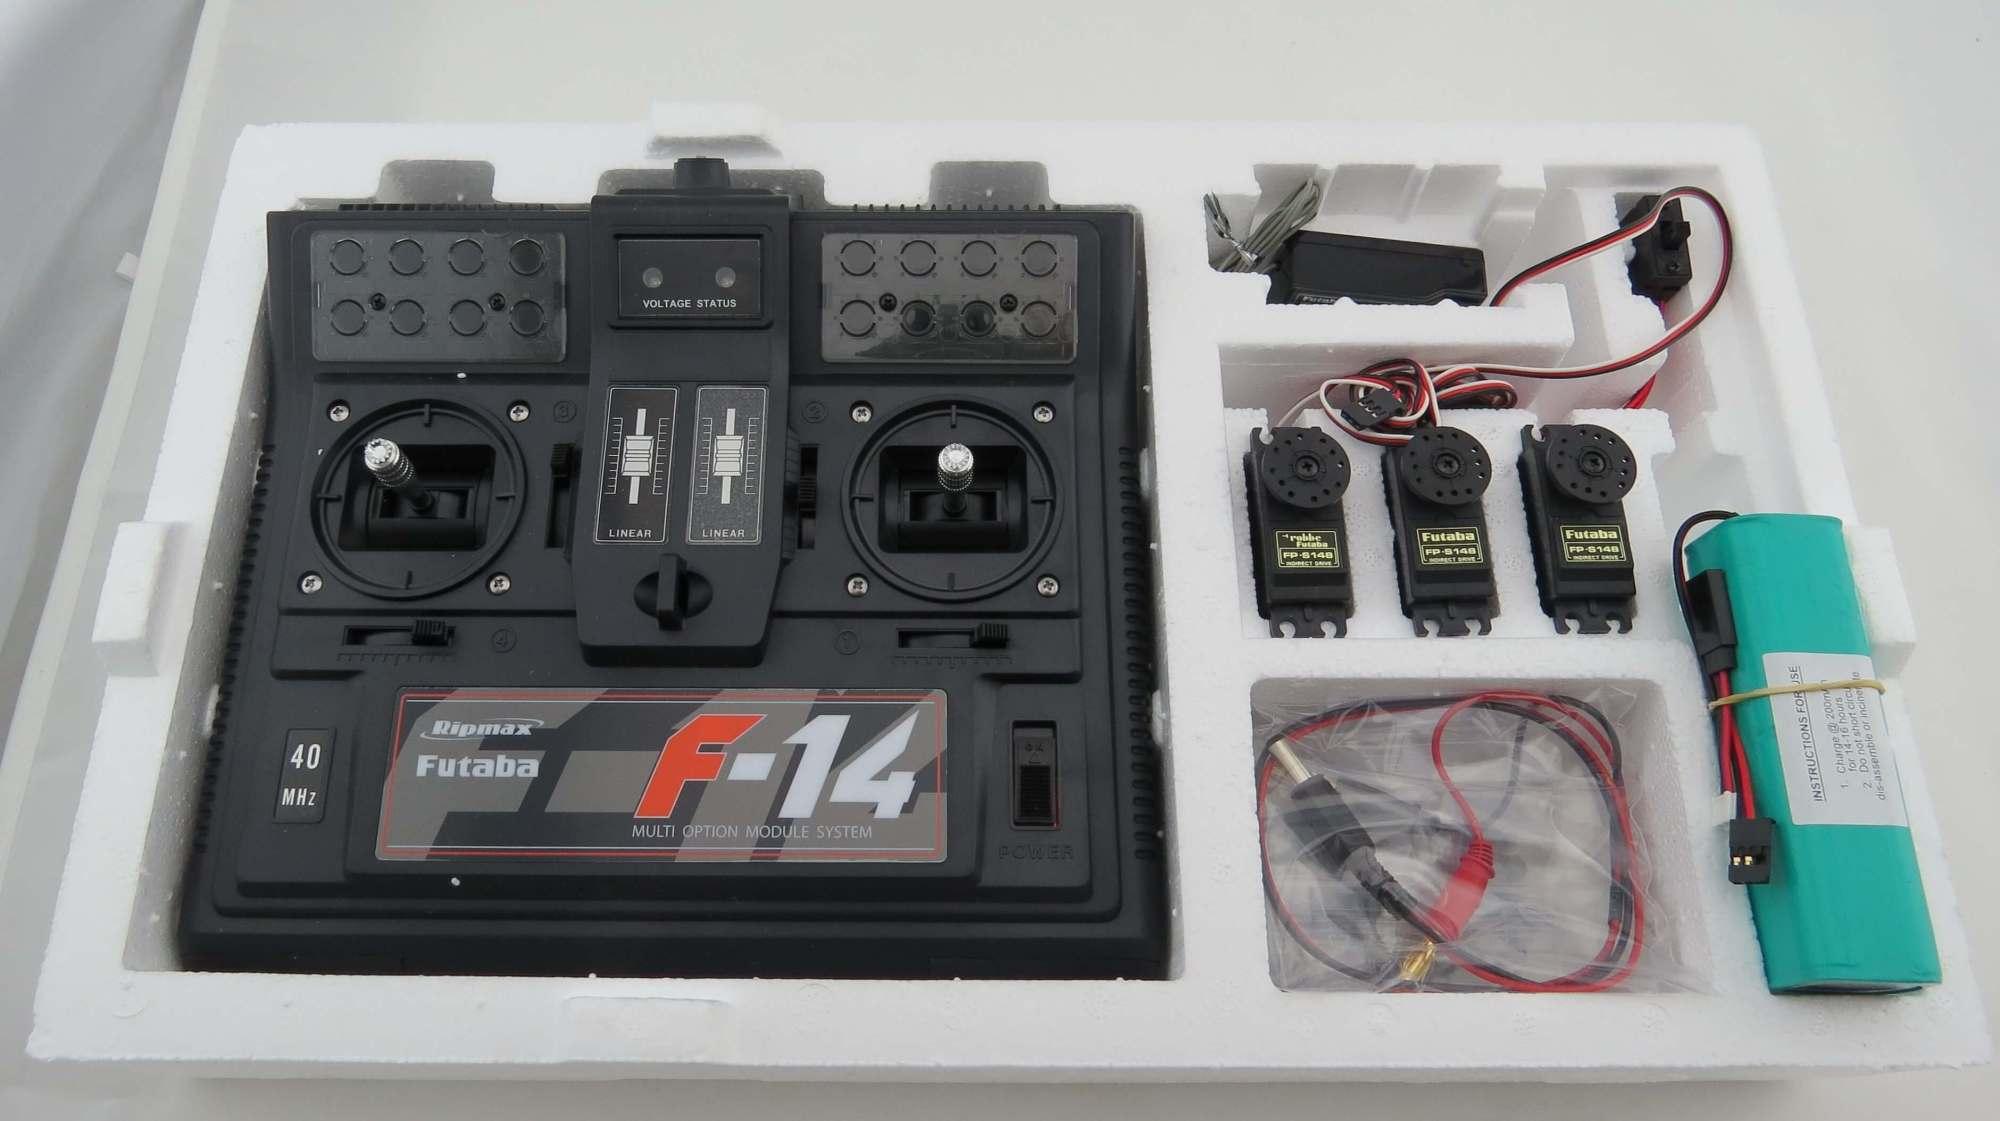 hight resolution of radio control robbe futaba f4014 f 14 40mhz rc system in fechtner modellbaushop